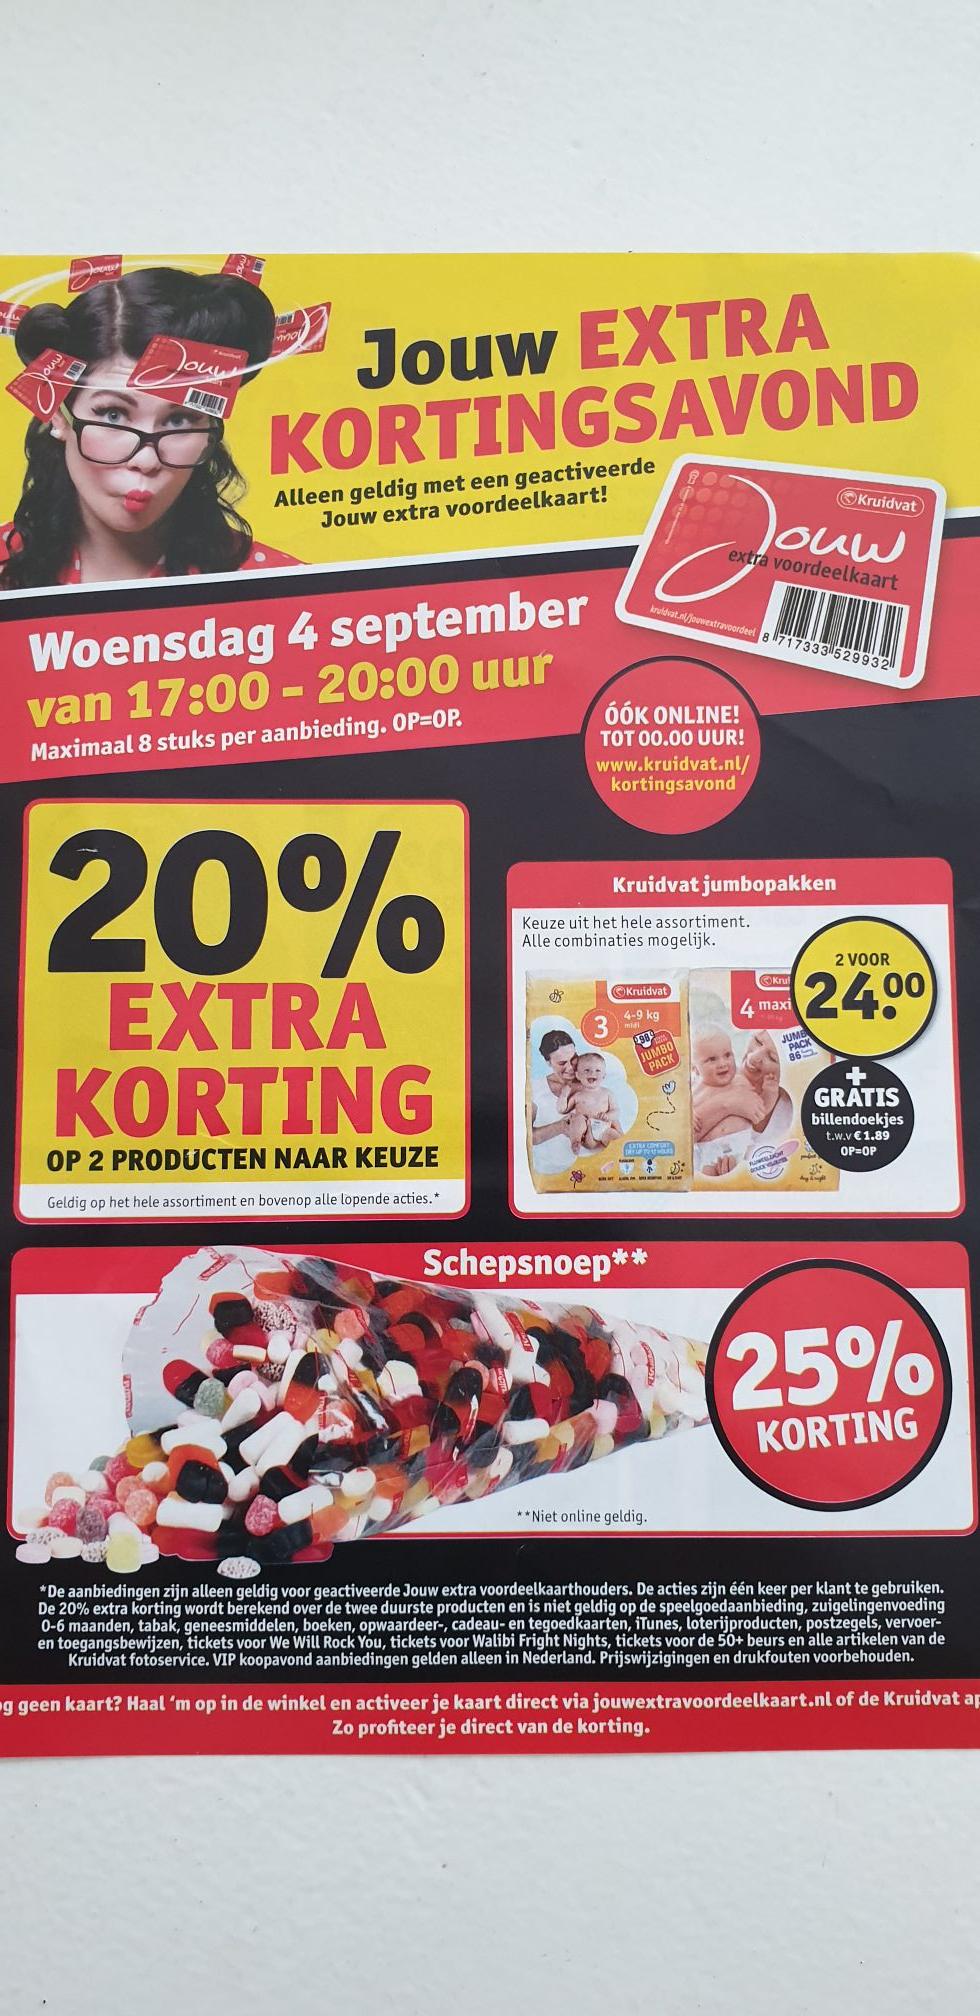 Kruidvat koopavond - 20% extra korting